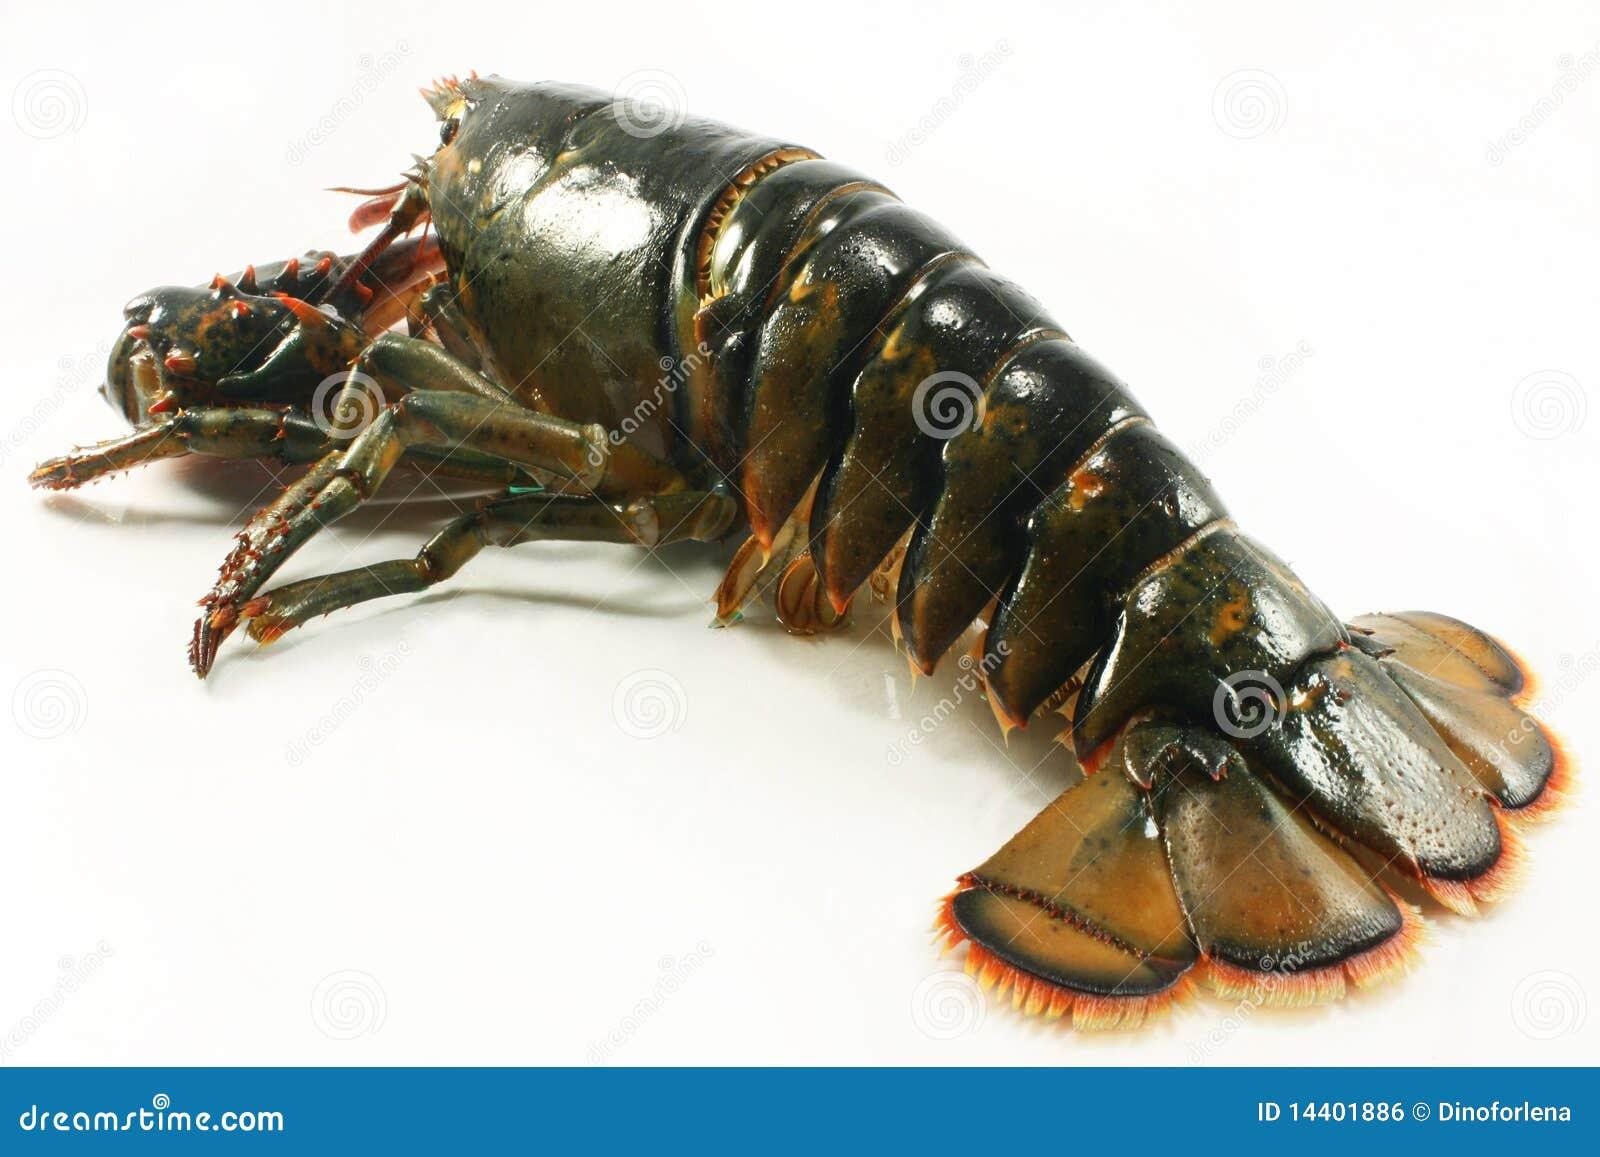 Live lobster stock photo. Image of animal, invertebrate - 14401886